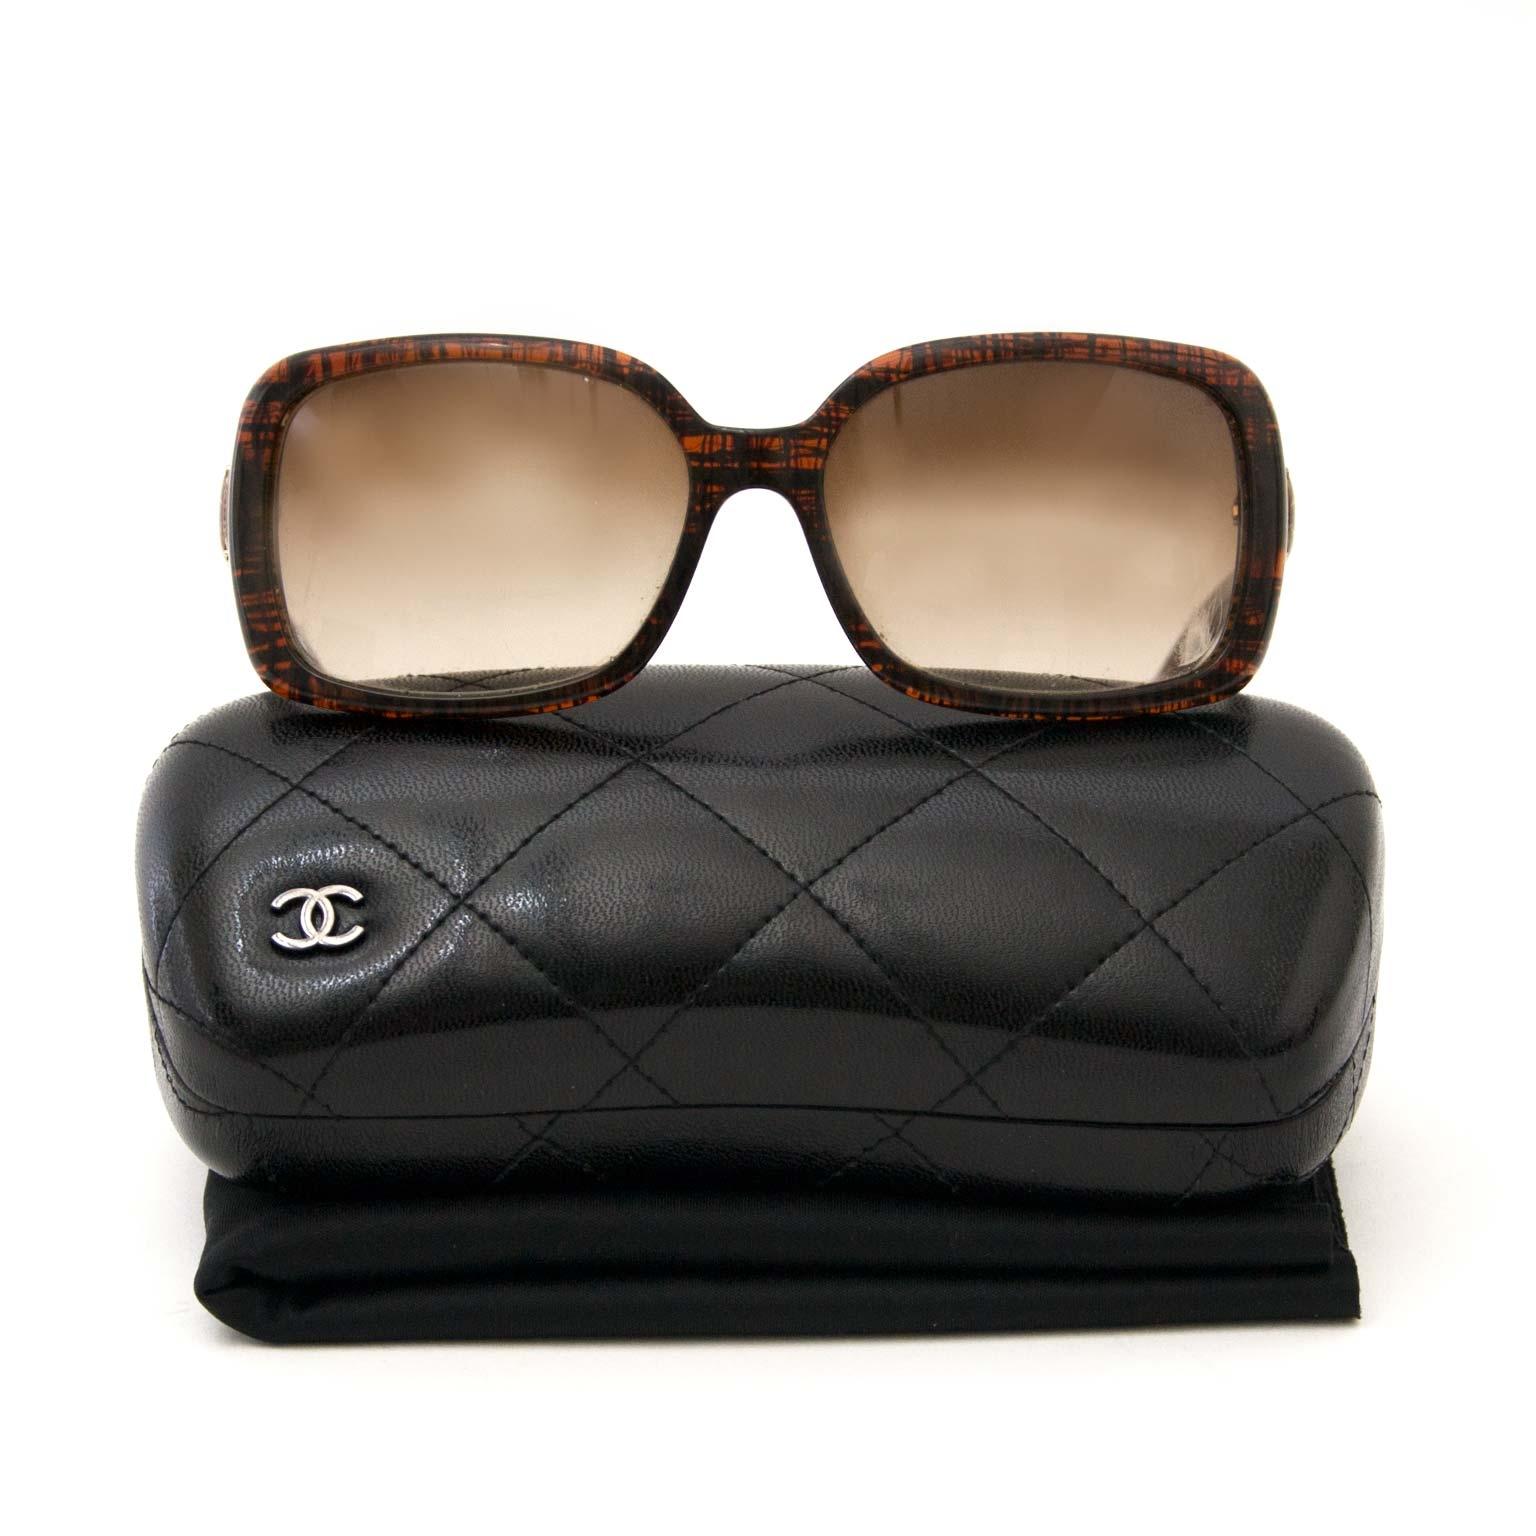 127f4a04321 authentieke Chanel Brown Glitter Sunglasses te koop bij labellov authentic  Chanel Brown Glitter Sunglasses for sale at labellov